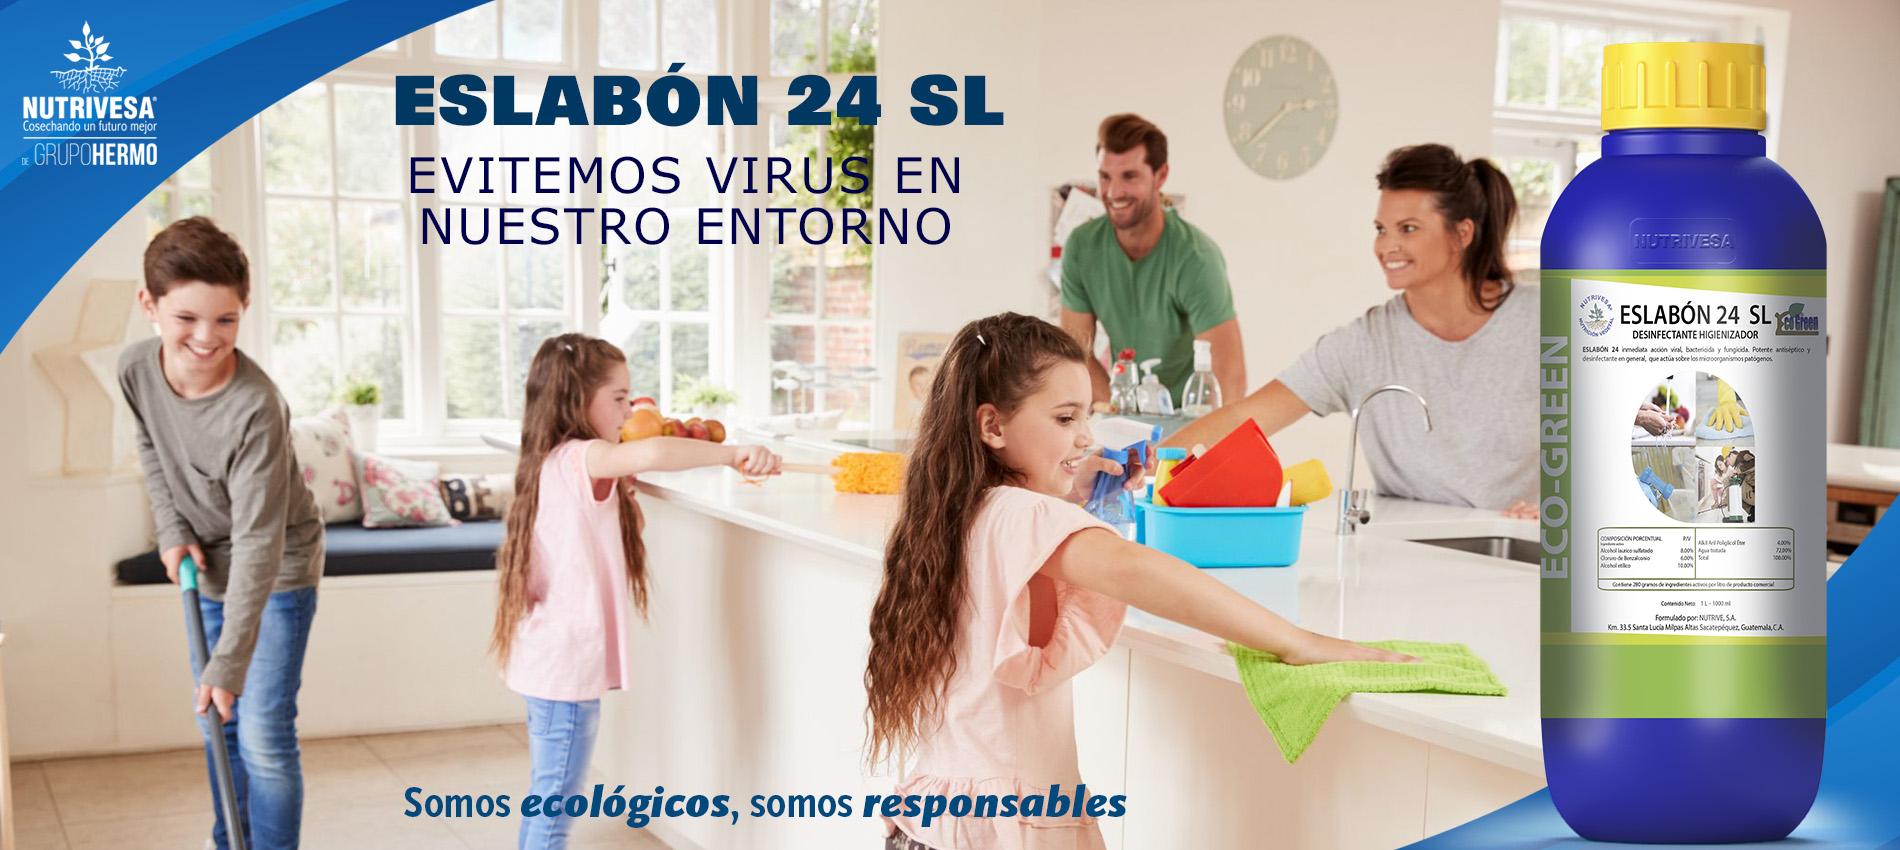 Eslabon  24 SL | Nutrivesa